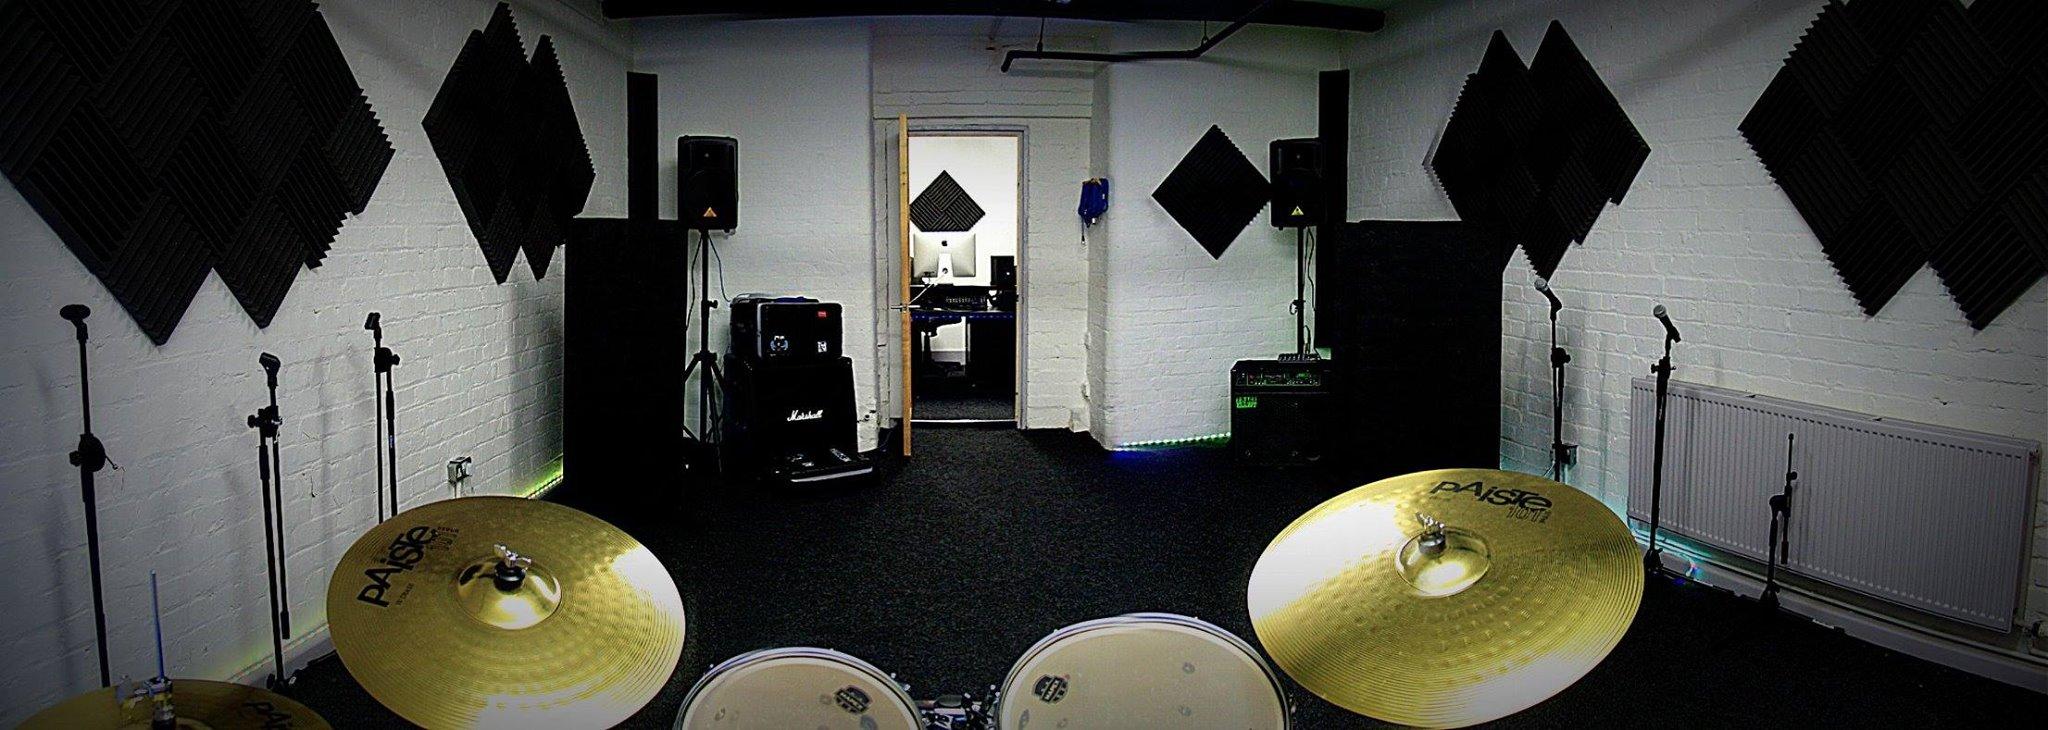 G-Studios-4.jpg